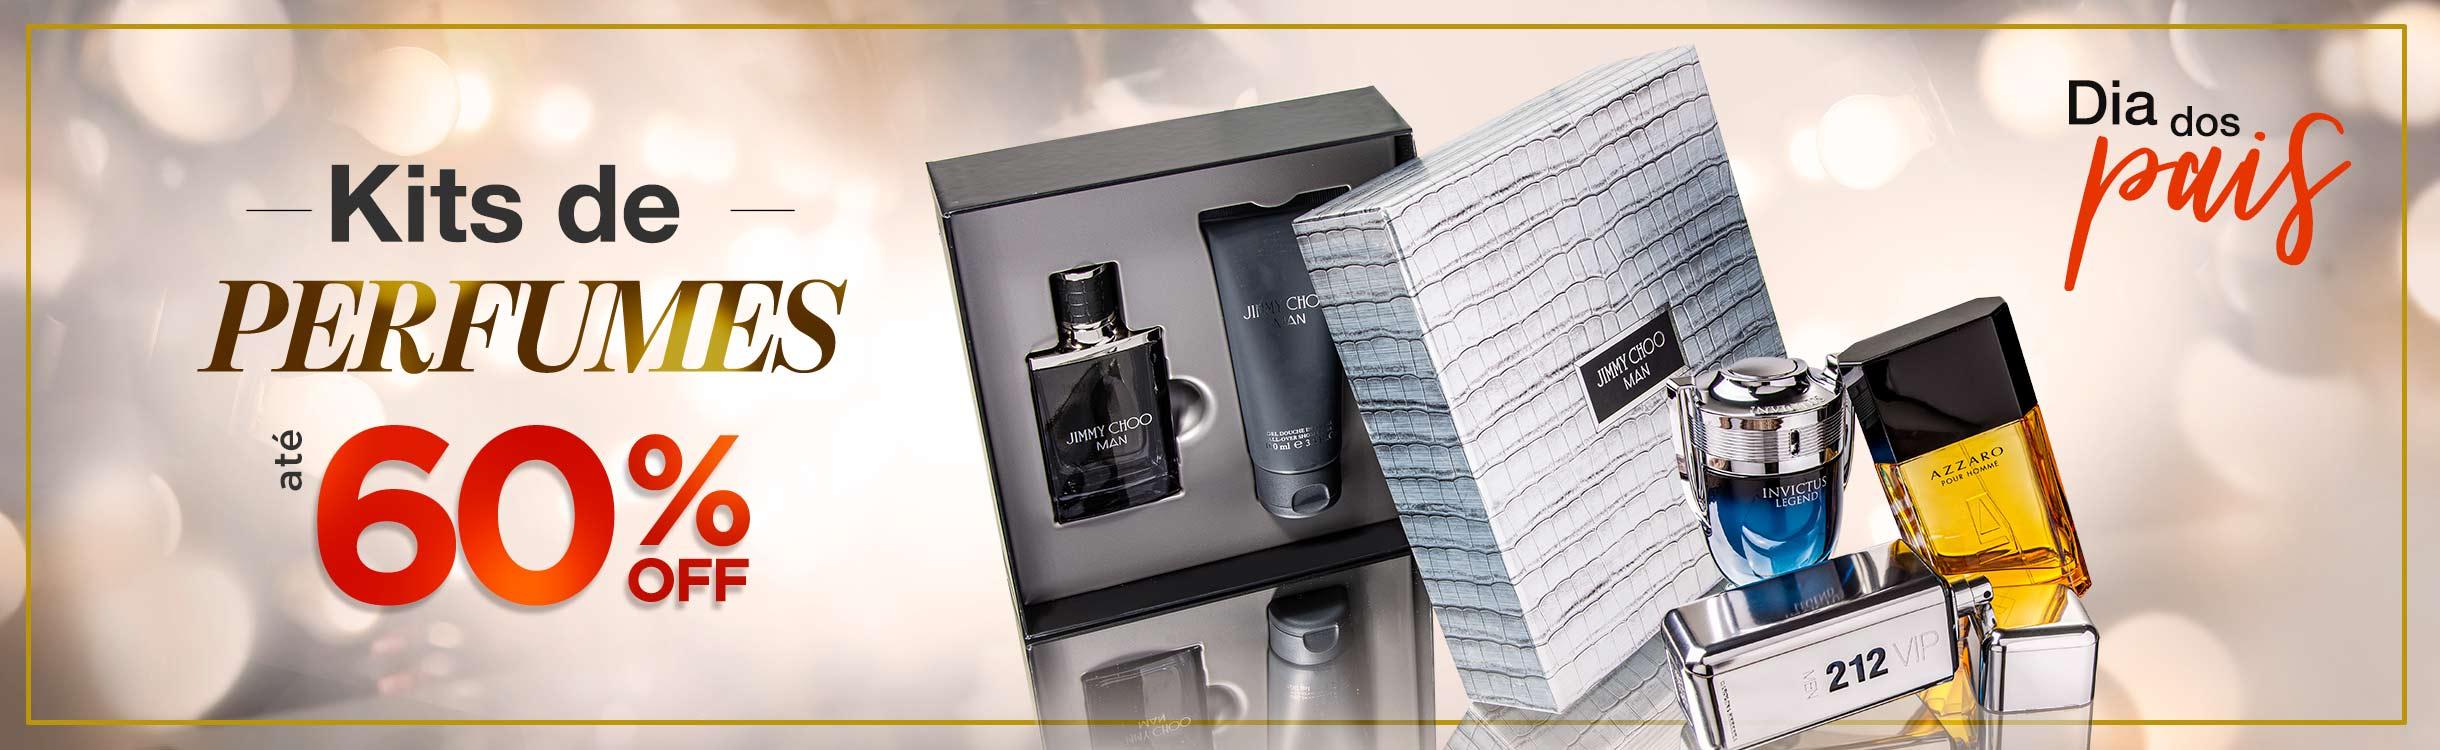 Kits de Perfumes para Ele